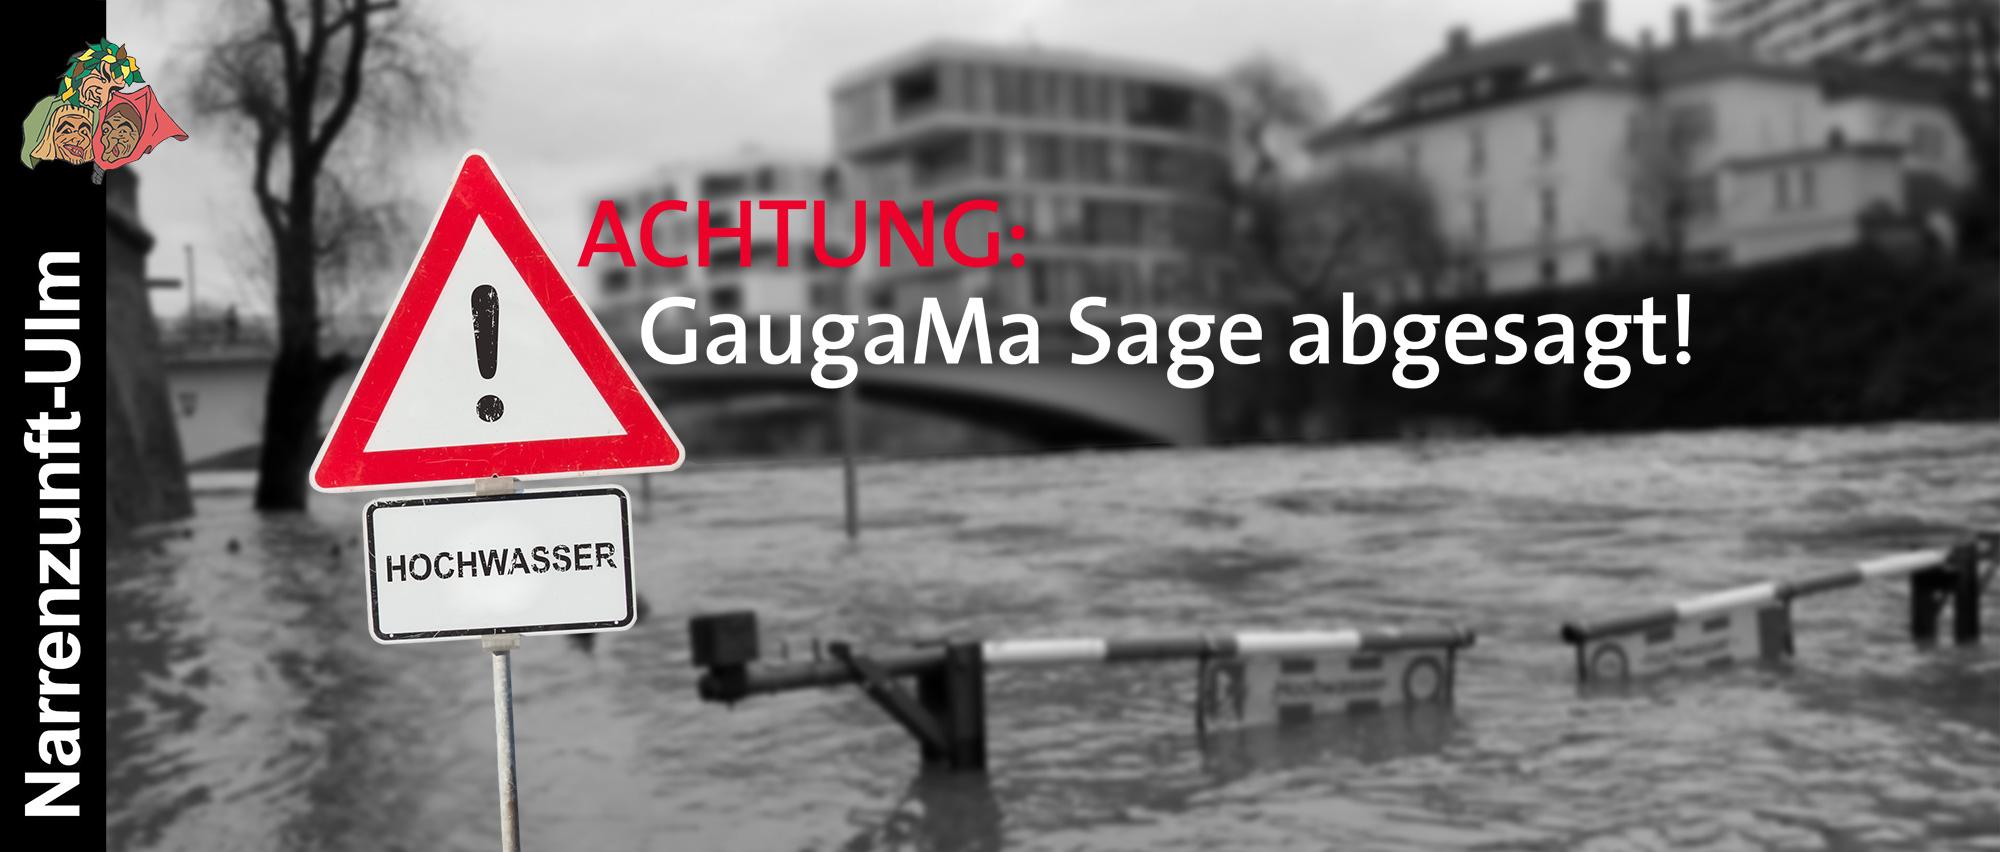 GaugaMa-Absage-Titelbild